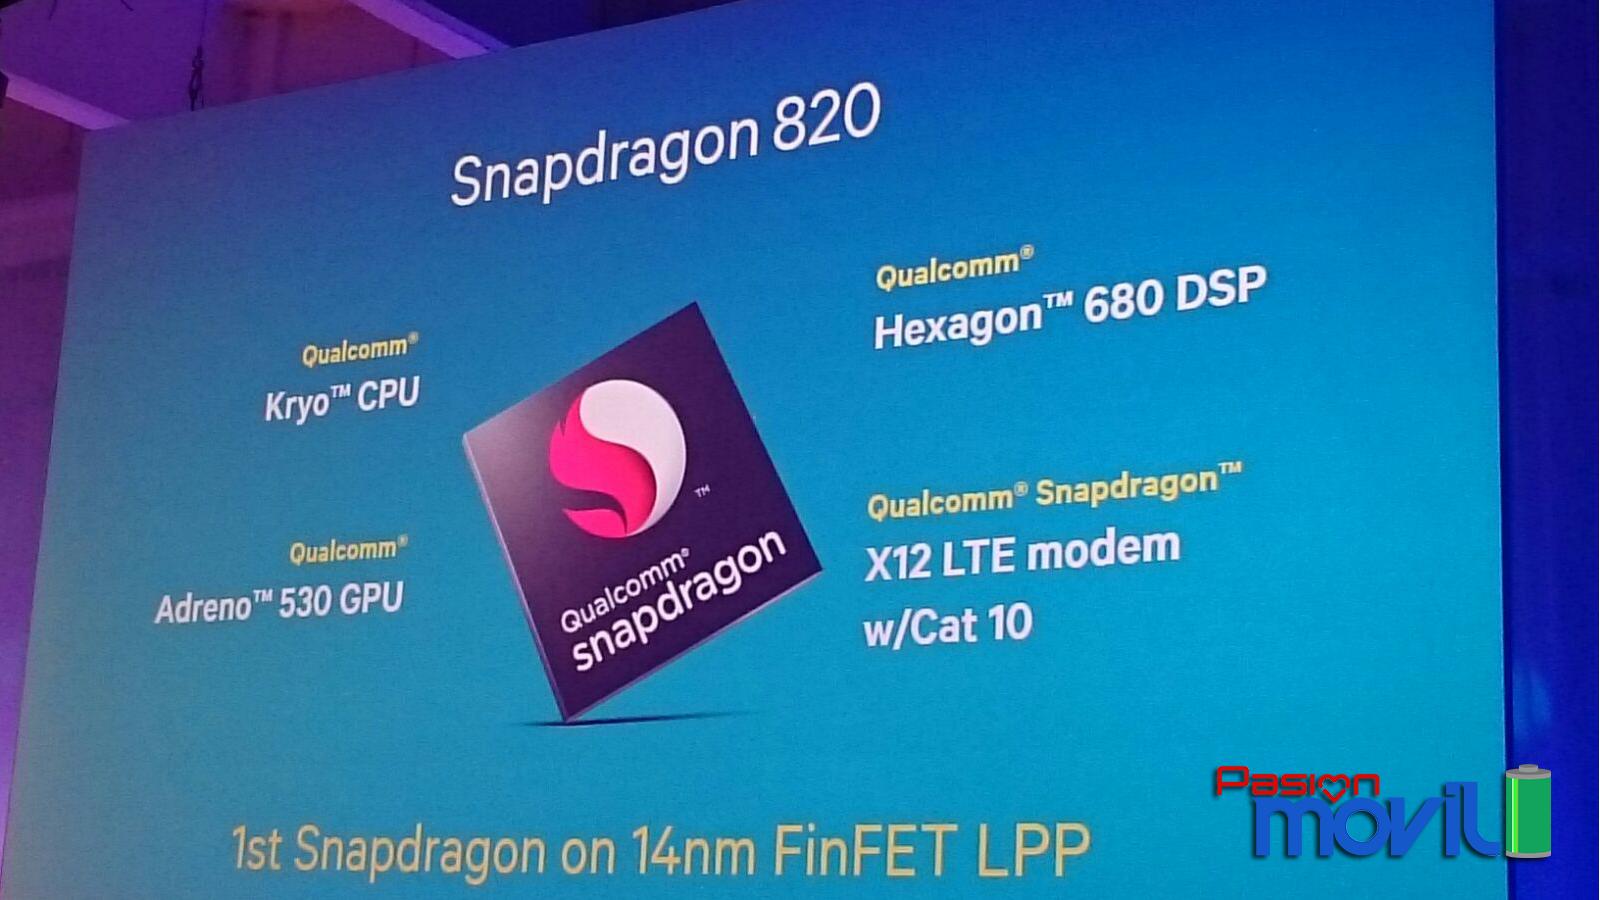 presentacion qualcomm snapdragon 820-4